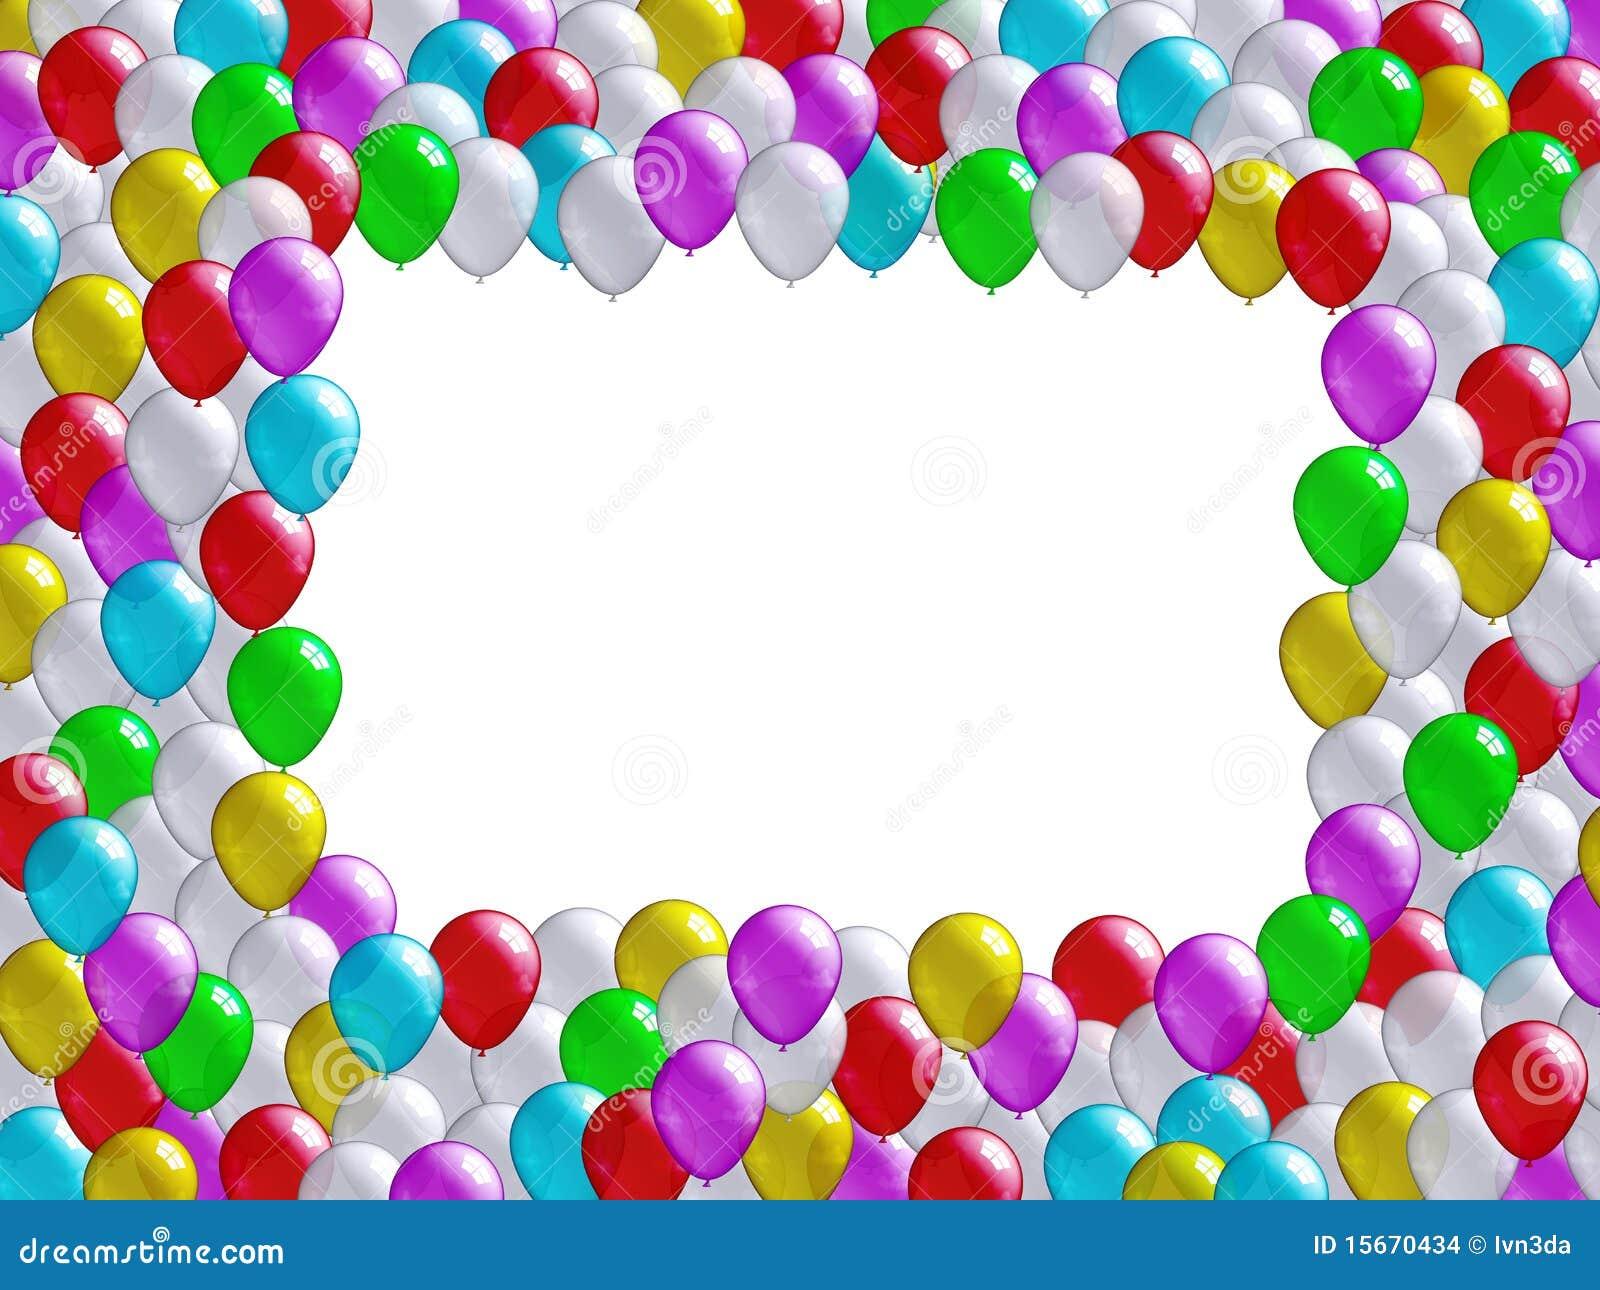 holiday balloons frame